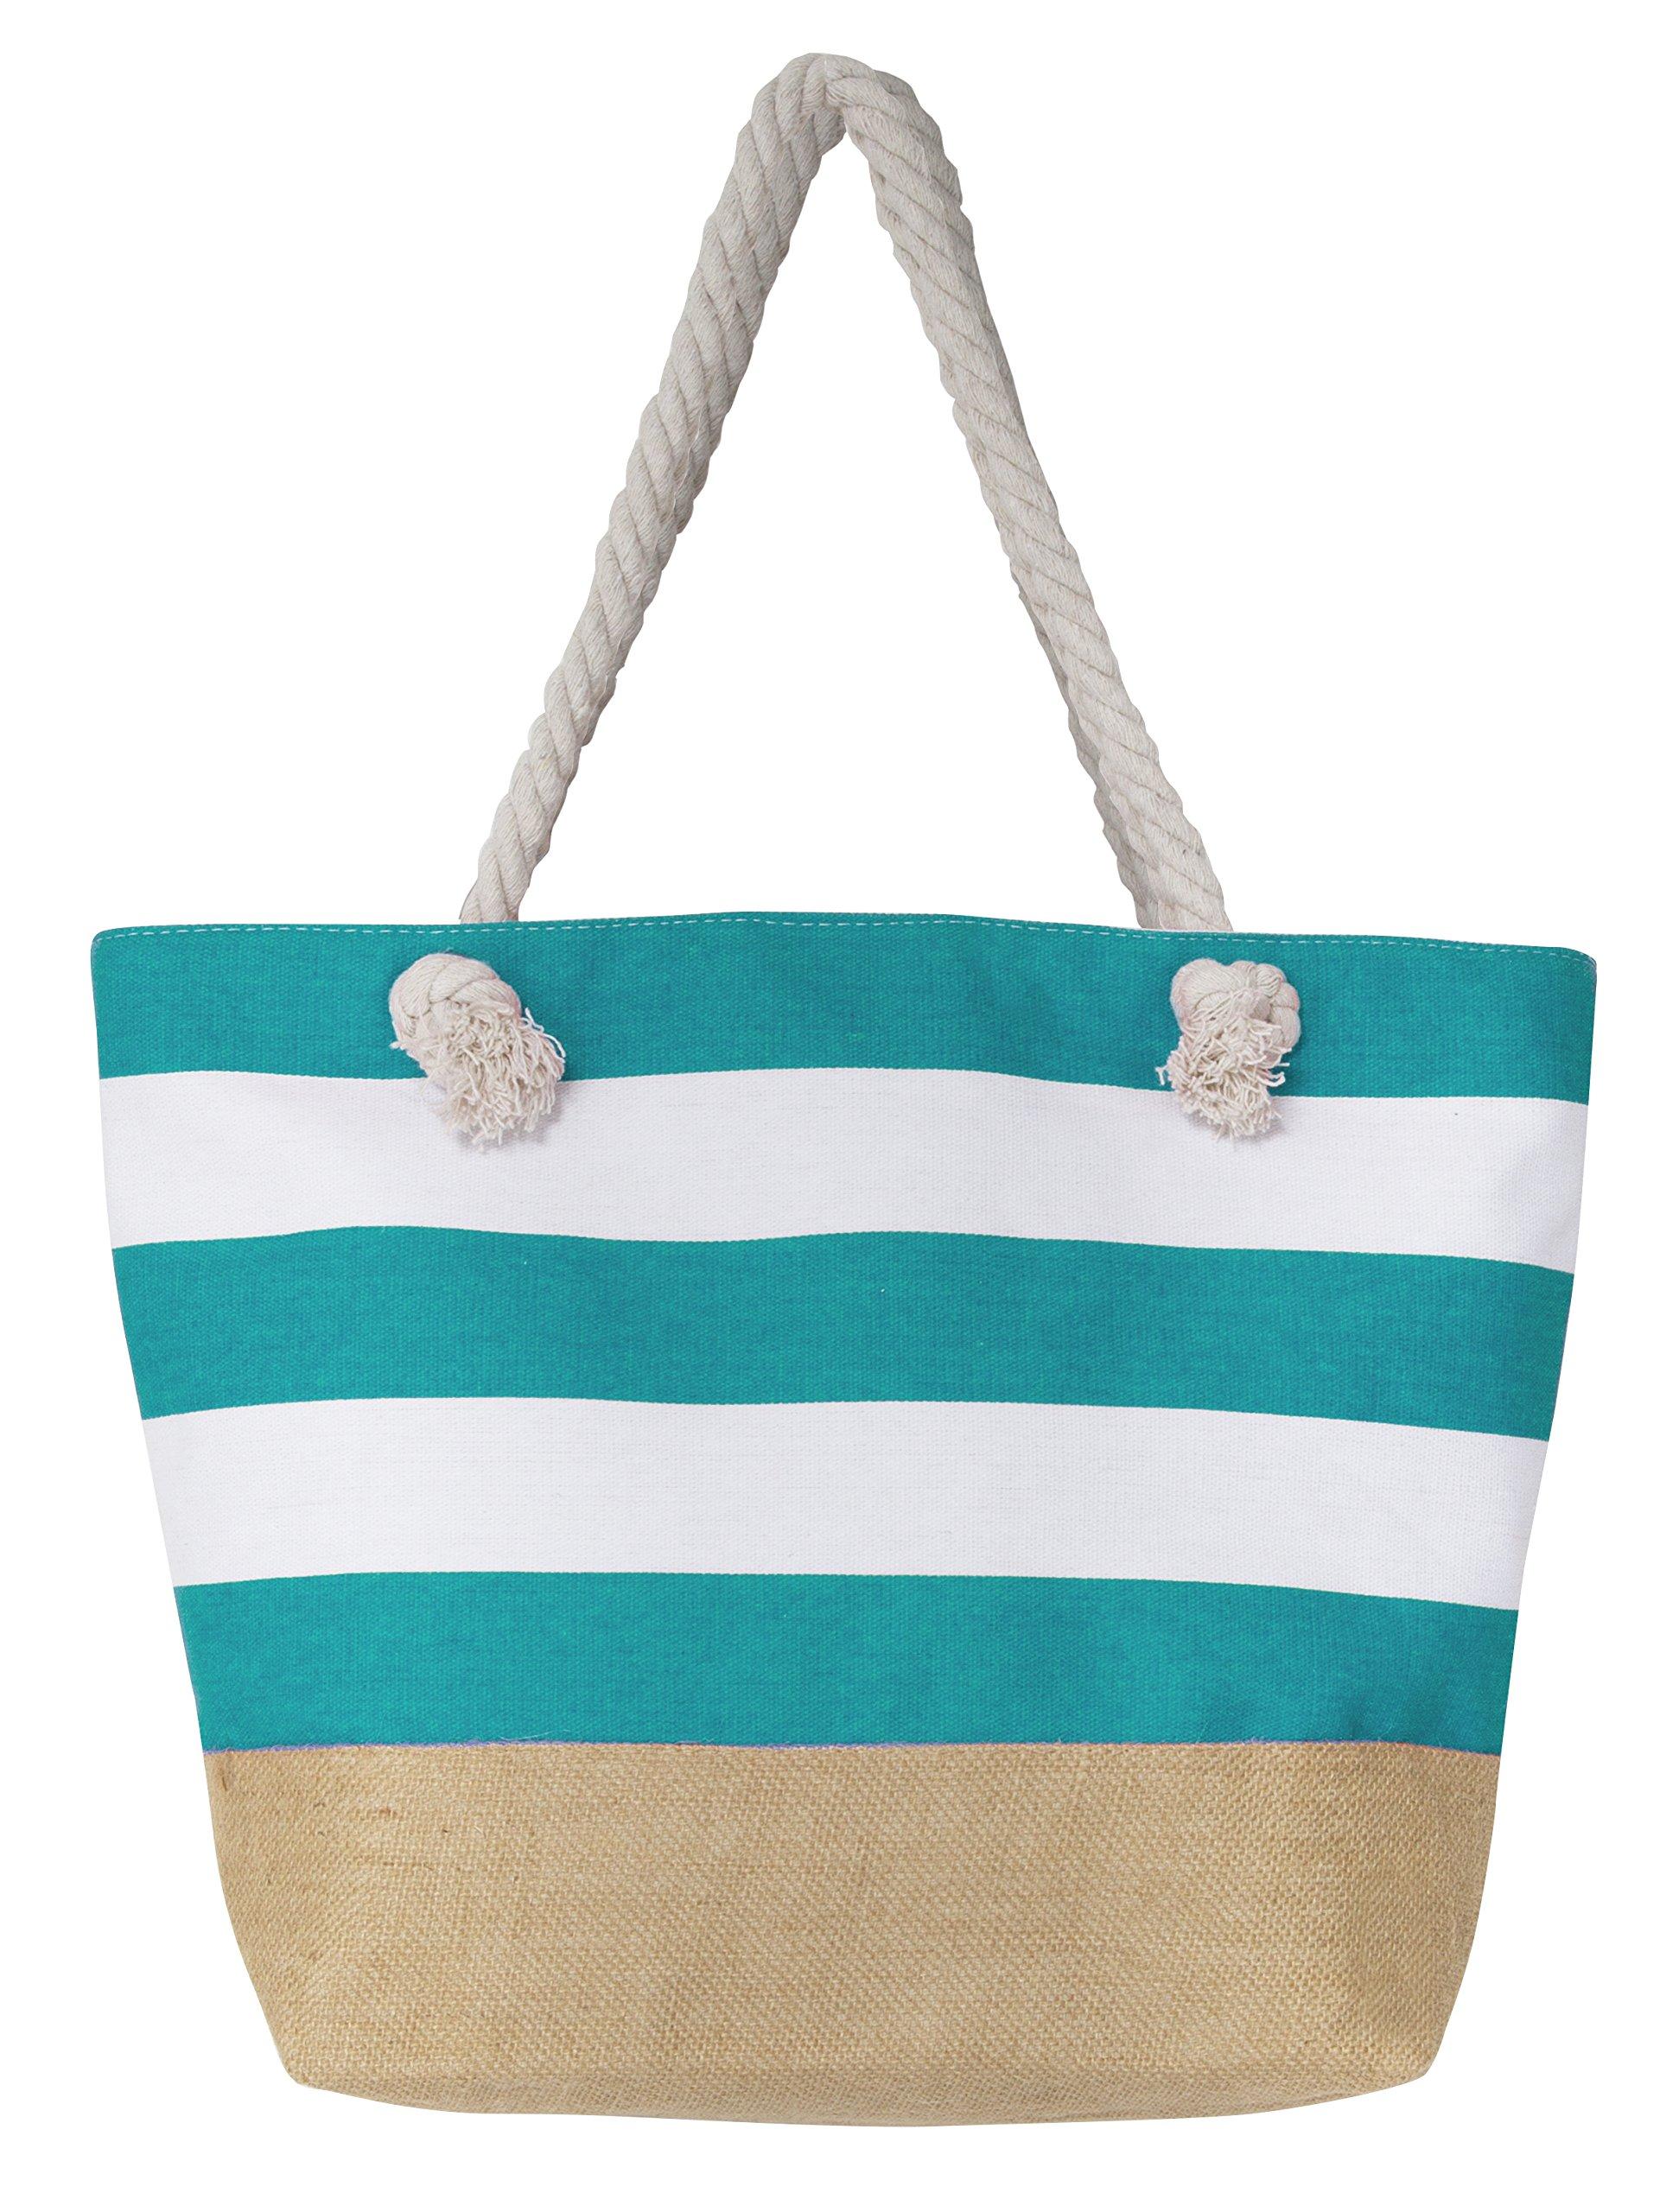 Leisureland Canvas Tote Beach Bag, Water Resistant Shoulder Tote Bag (L20 xH15 xW6, Stripe Blue)